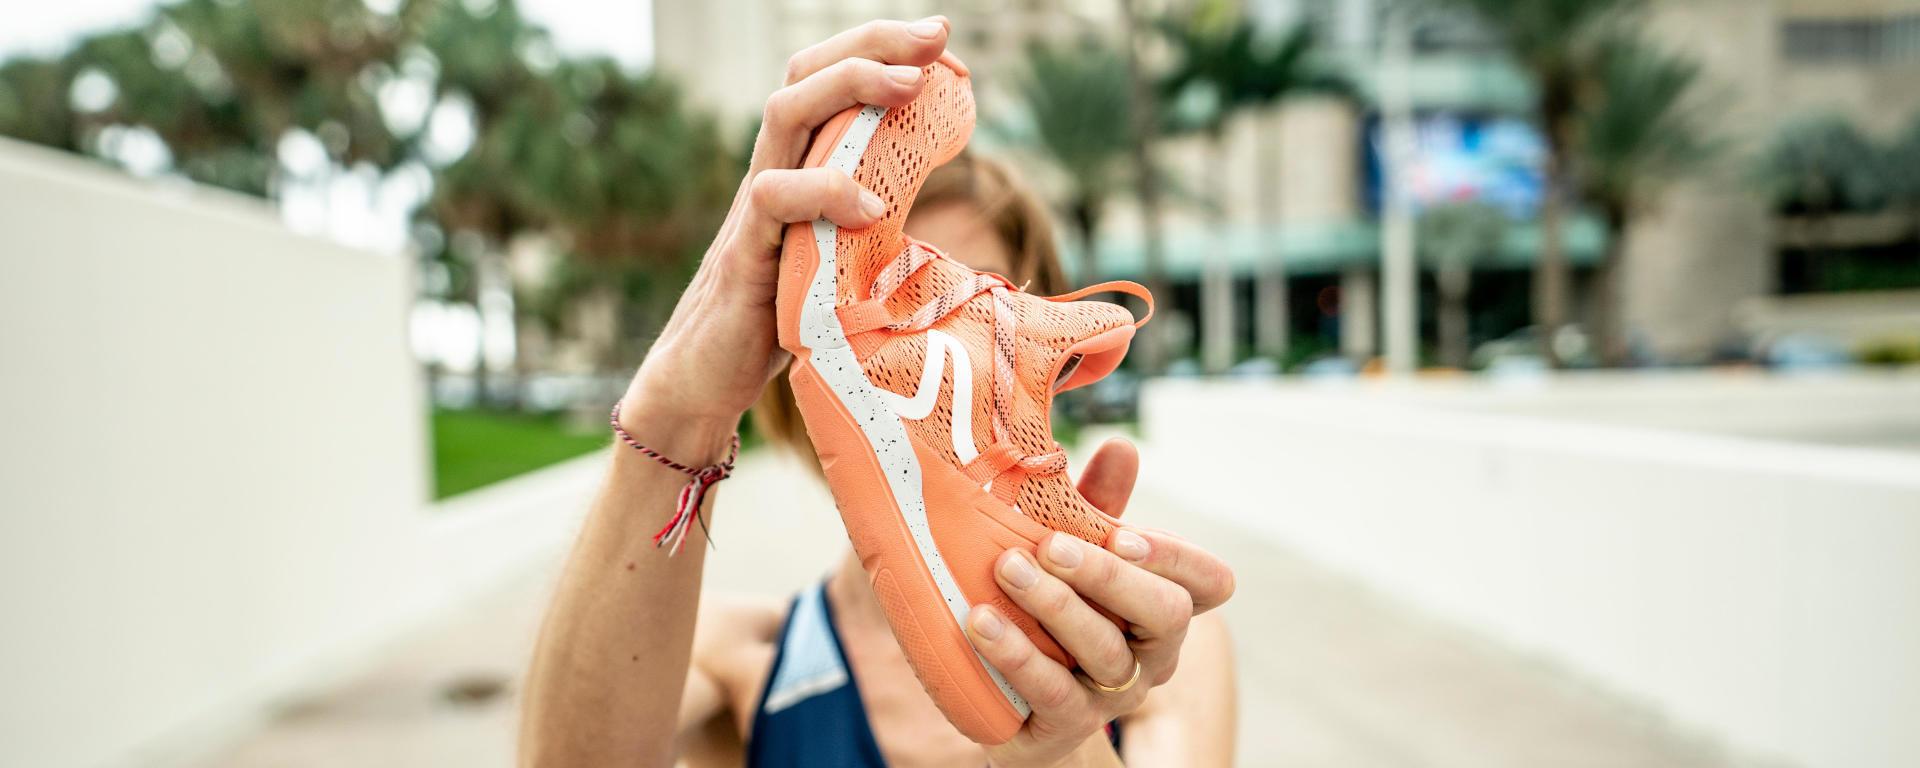 marche-marche-sportive-newfeel-flexibilité